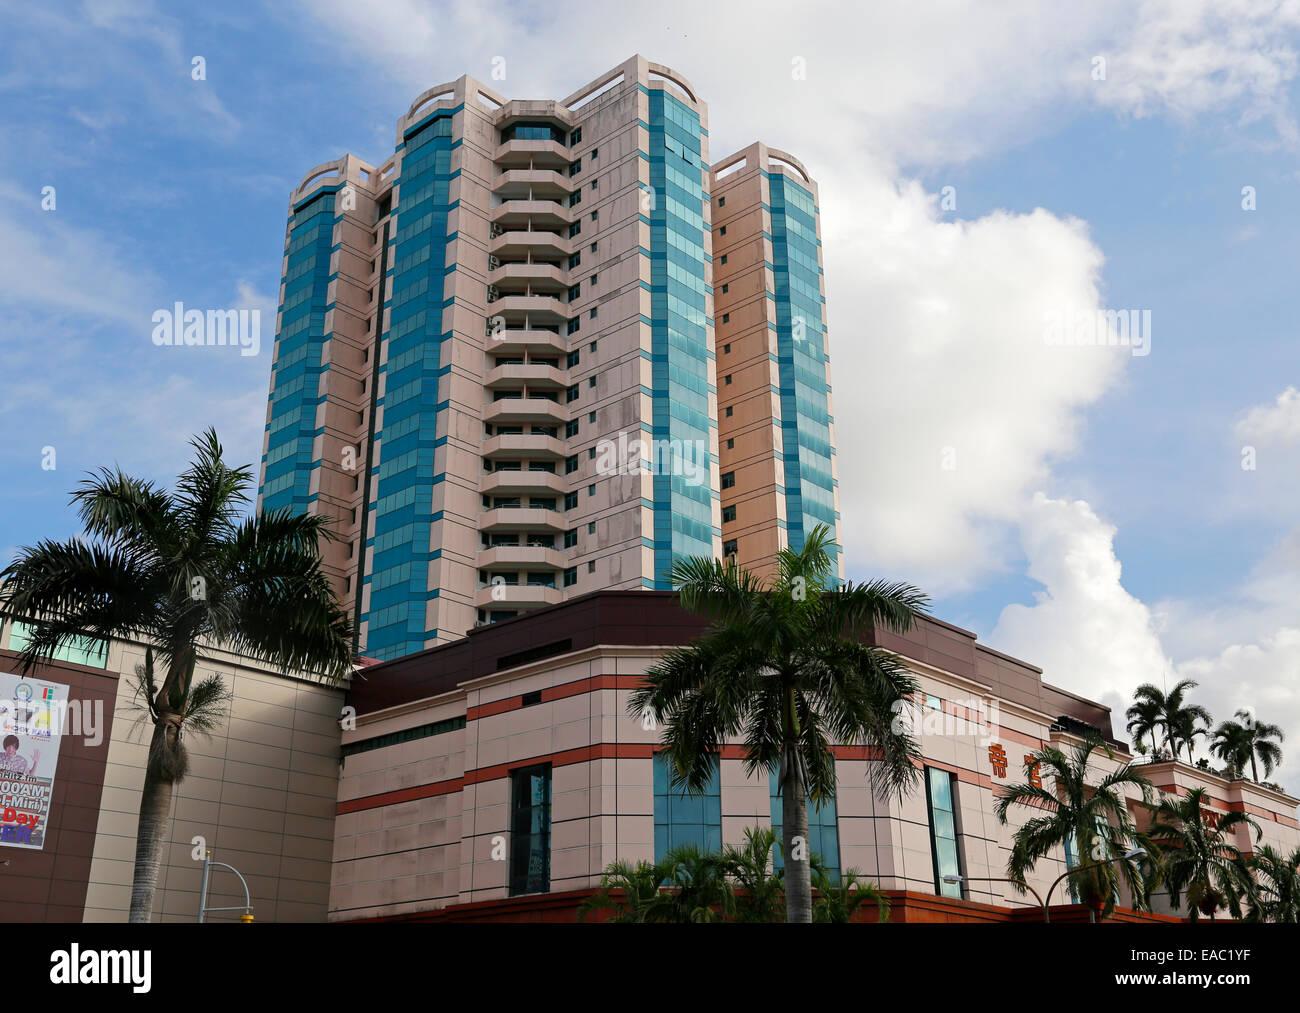 Imperial Palace Hotel and Shopping Mall, Miri, Sarawak, Malaysia - Stock Image